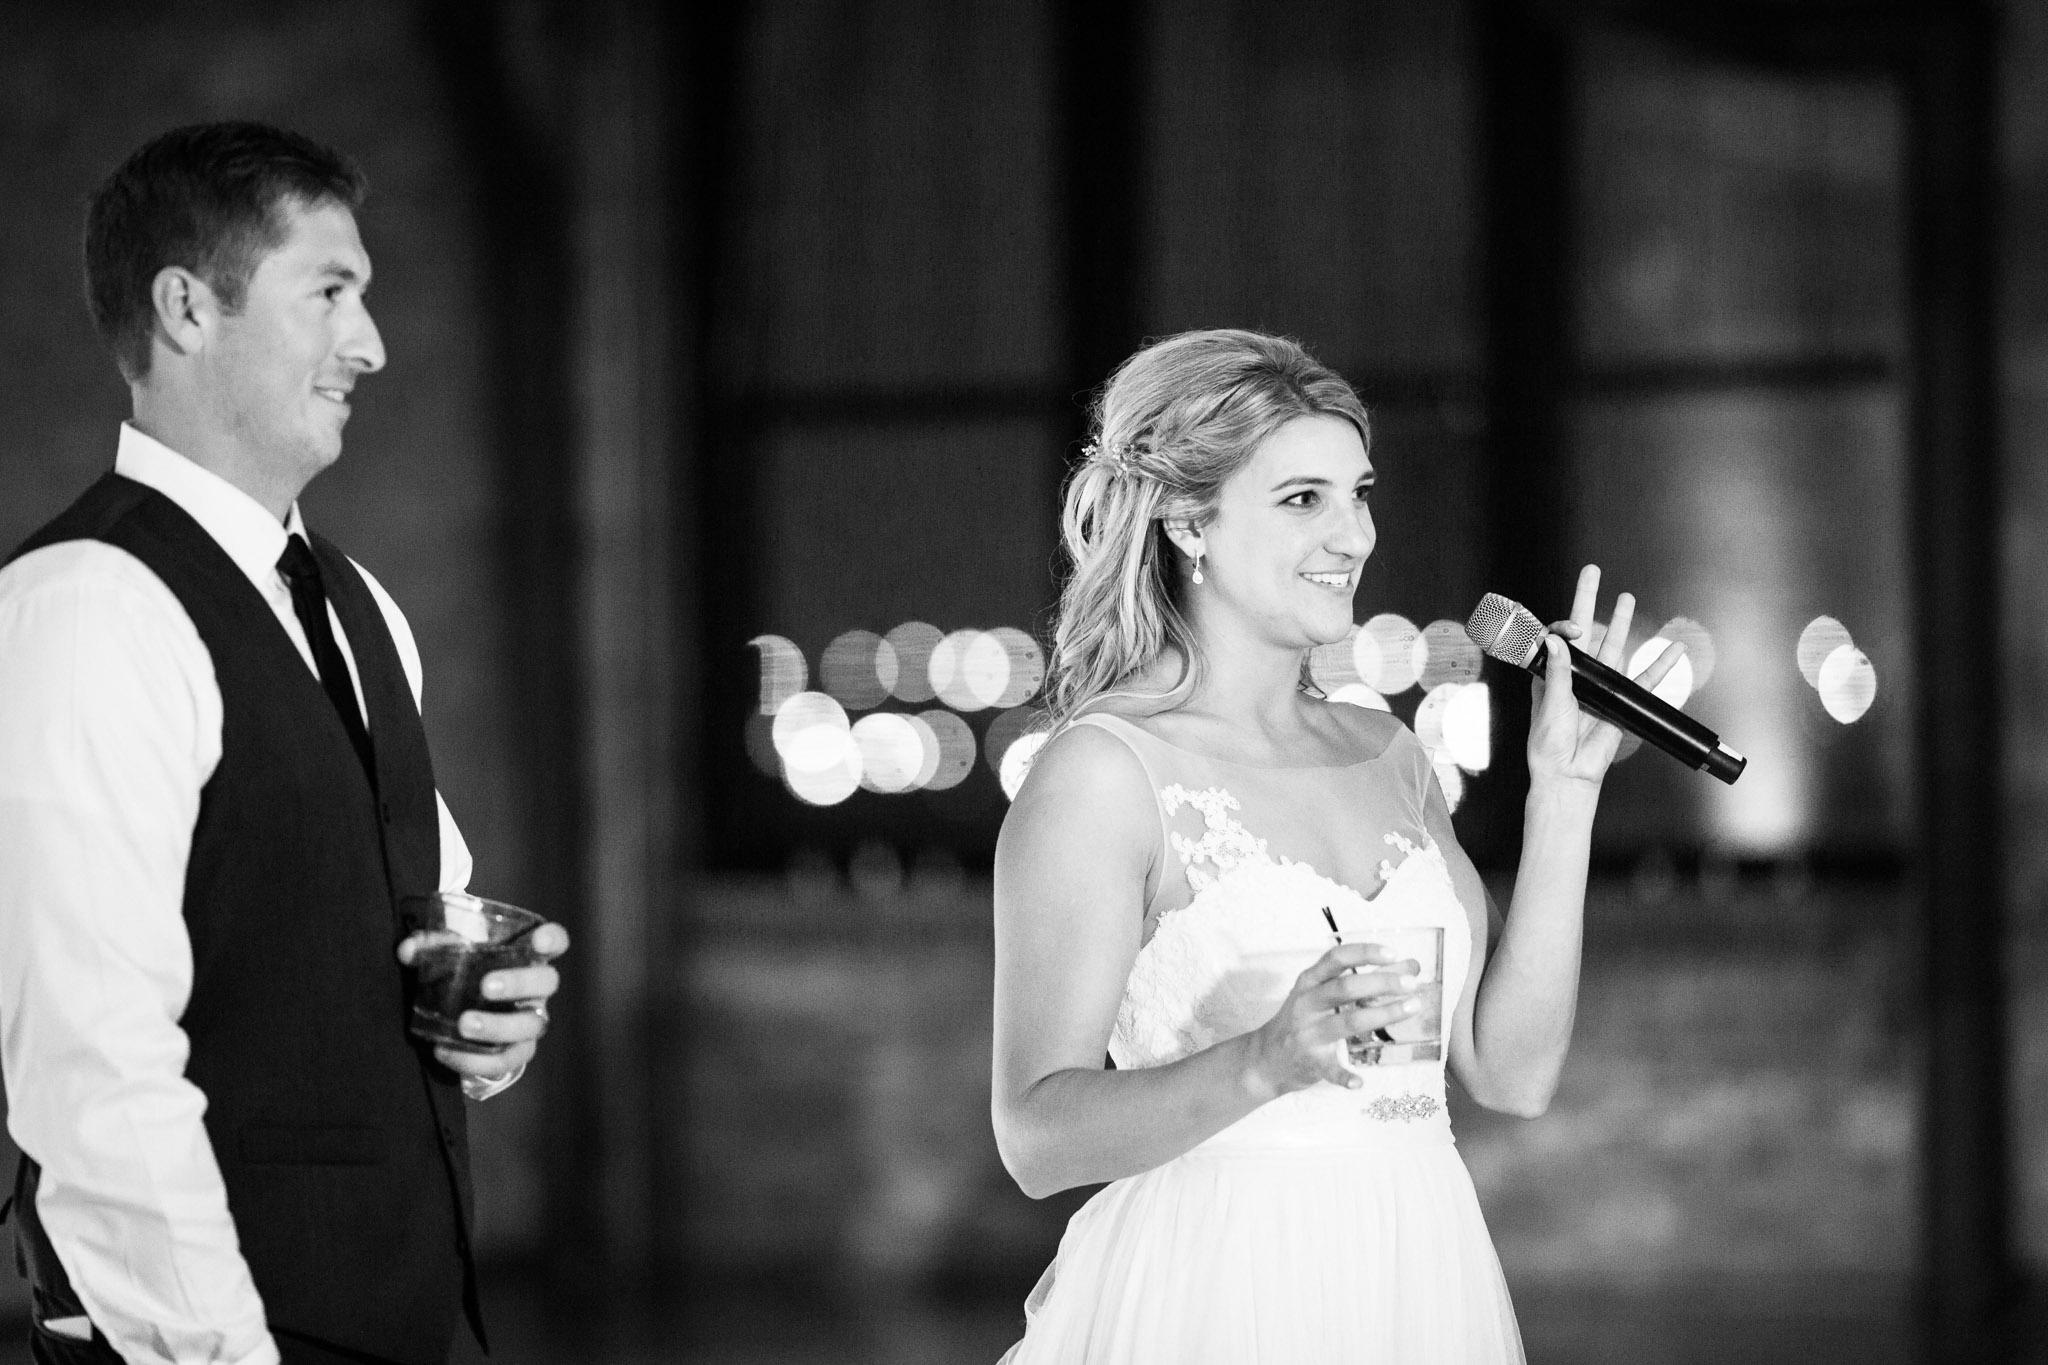 bridgeport-art-center-wedding-photos-41.jpg